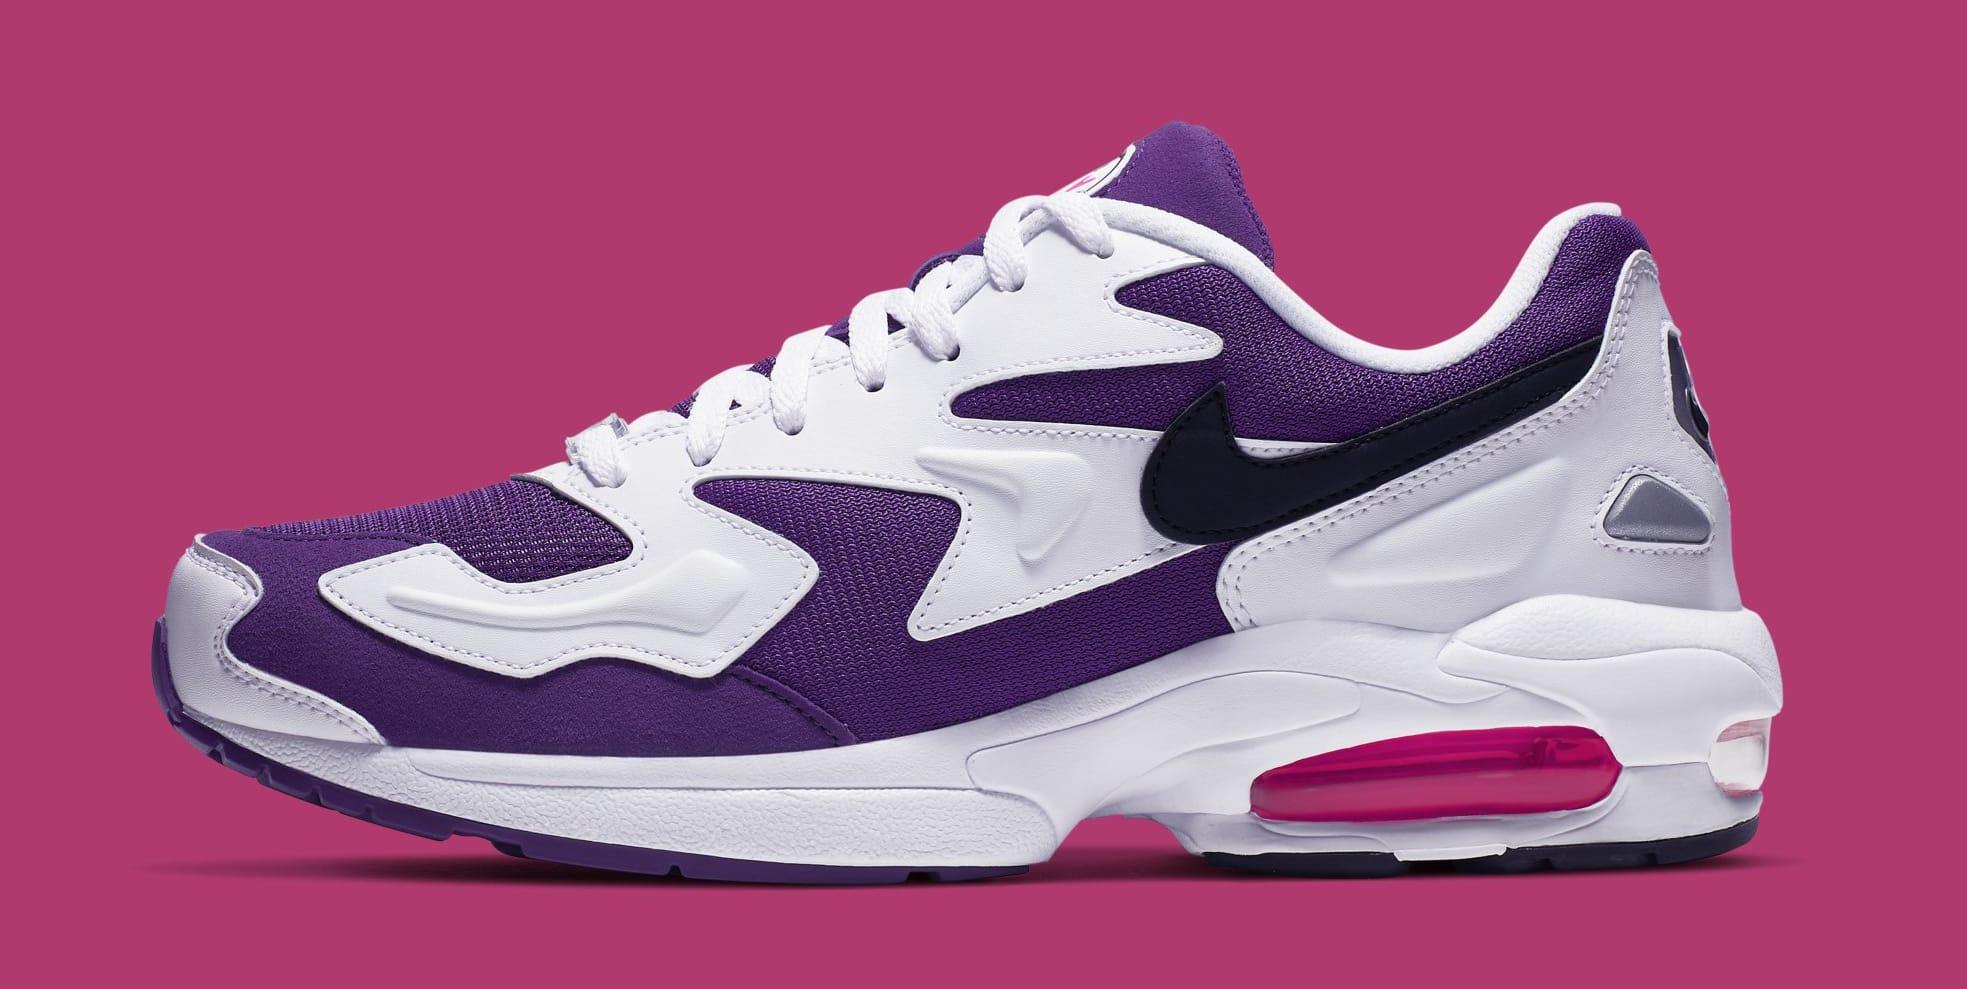 b2640b50e12 Nike Air Max2 Light  White Court Purple-Hyper Pink  AO1741-103 ...